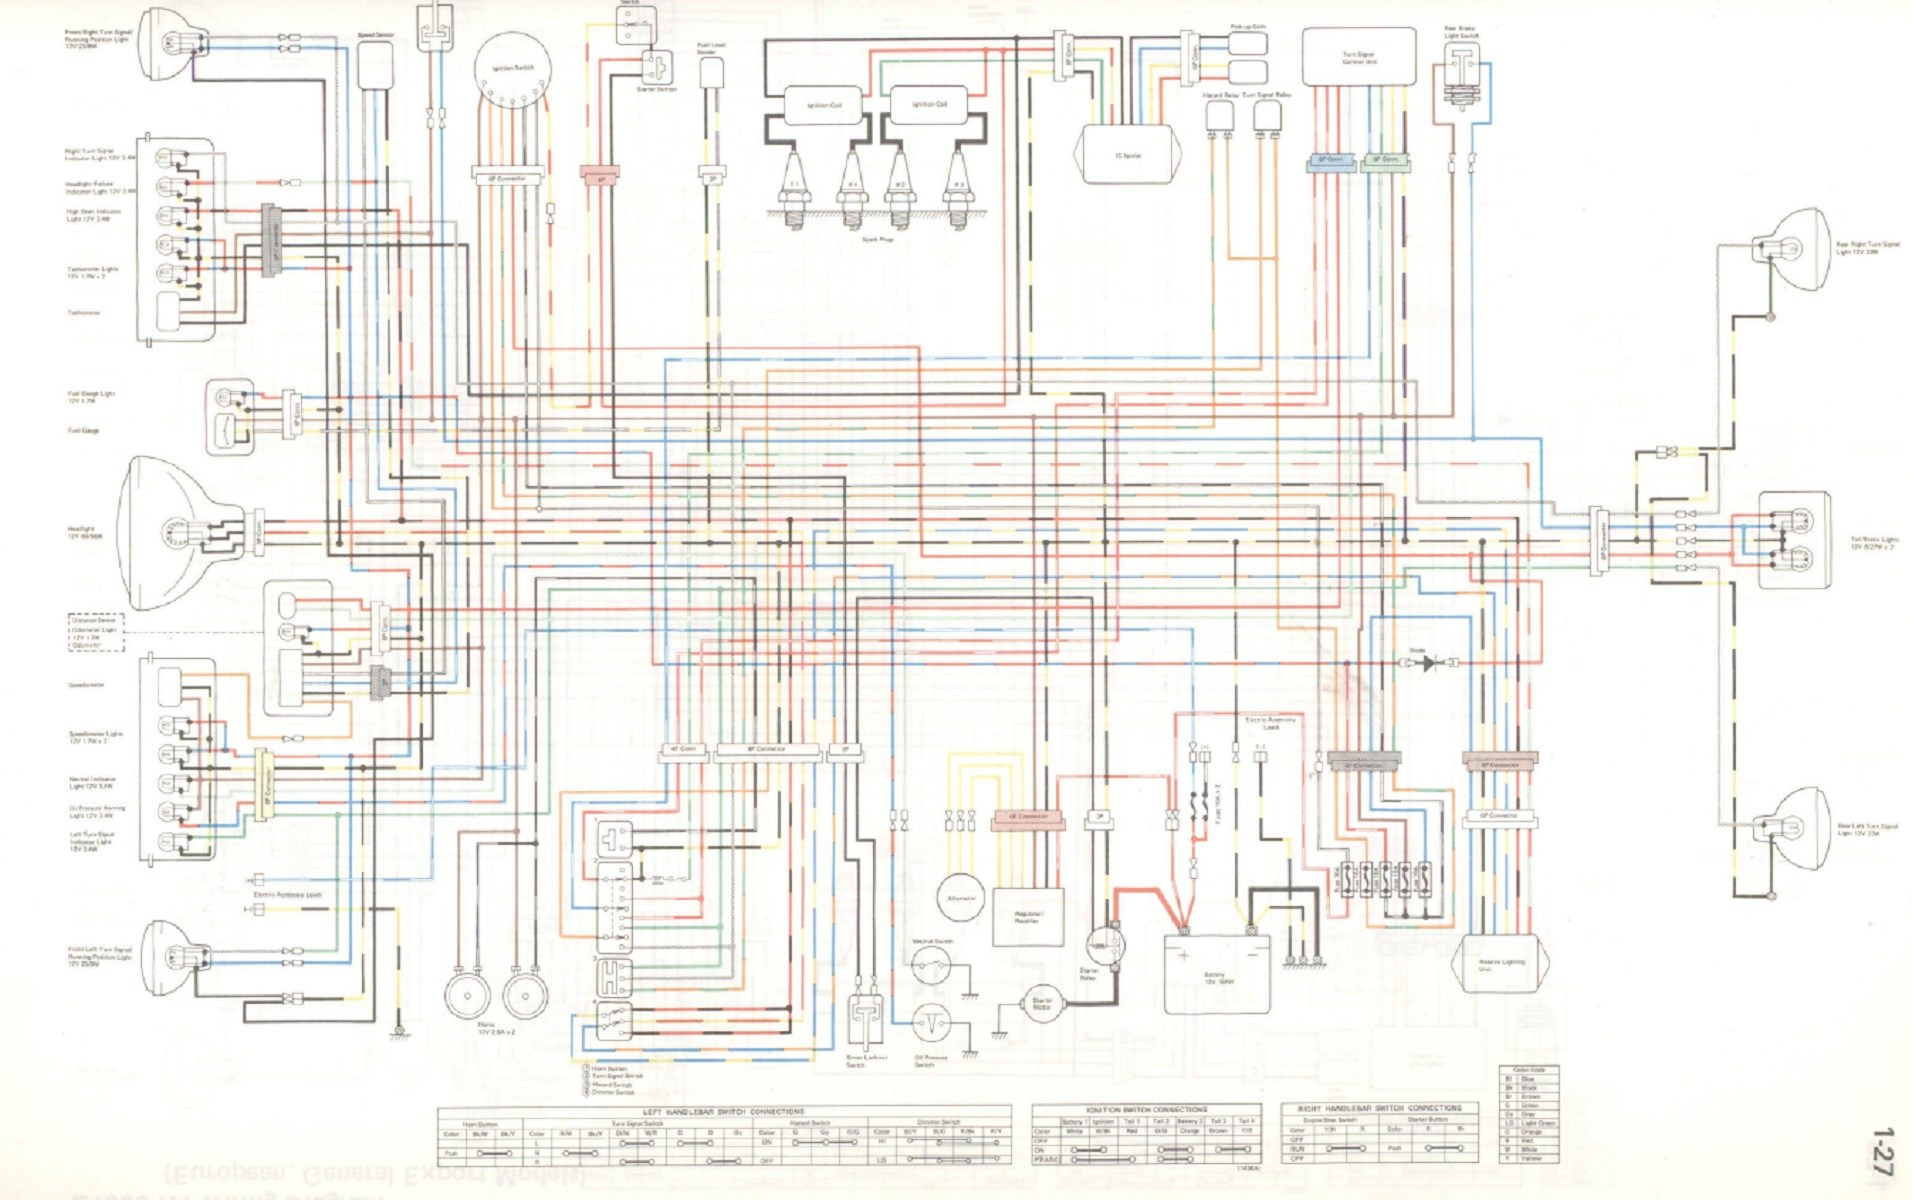 hight resolution of 1981 kz1000 wiring diagram wiring diagram name 1981 kawasaki kz440 wiring diagram 1981 kawasaki wiring diagram